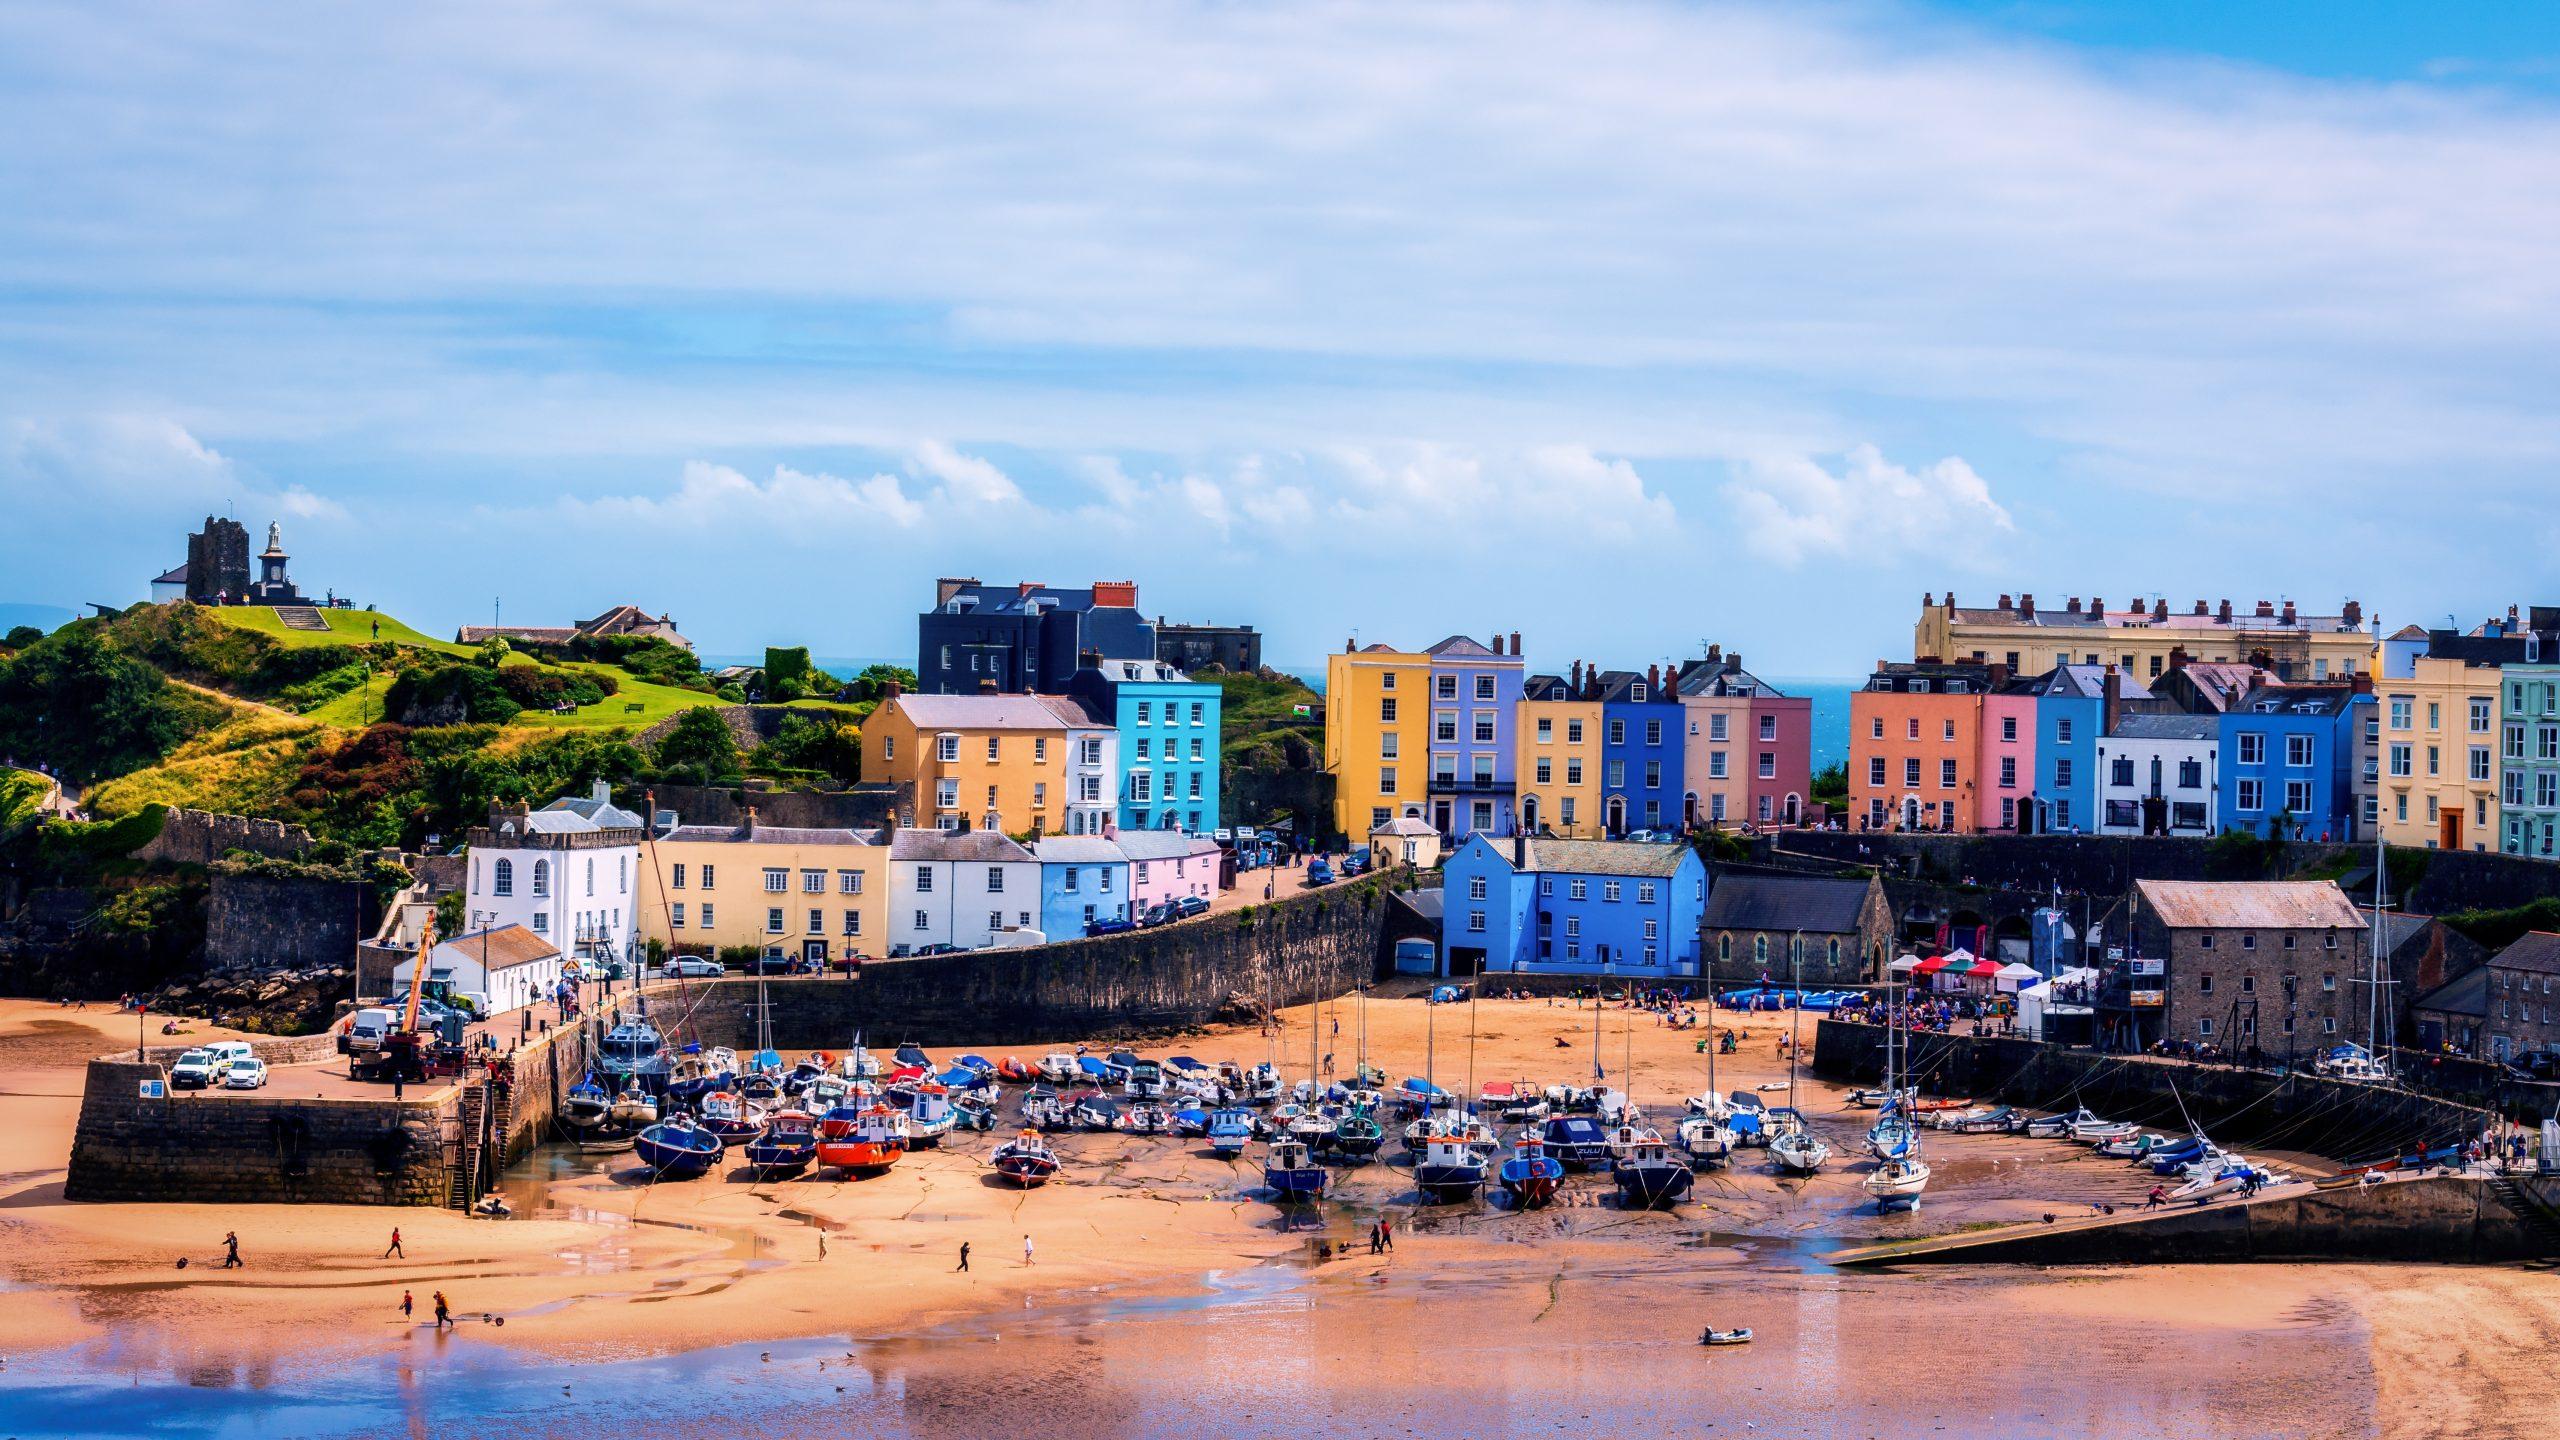 Travel: Discover Pembrokeshire